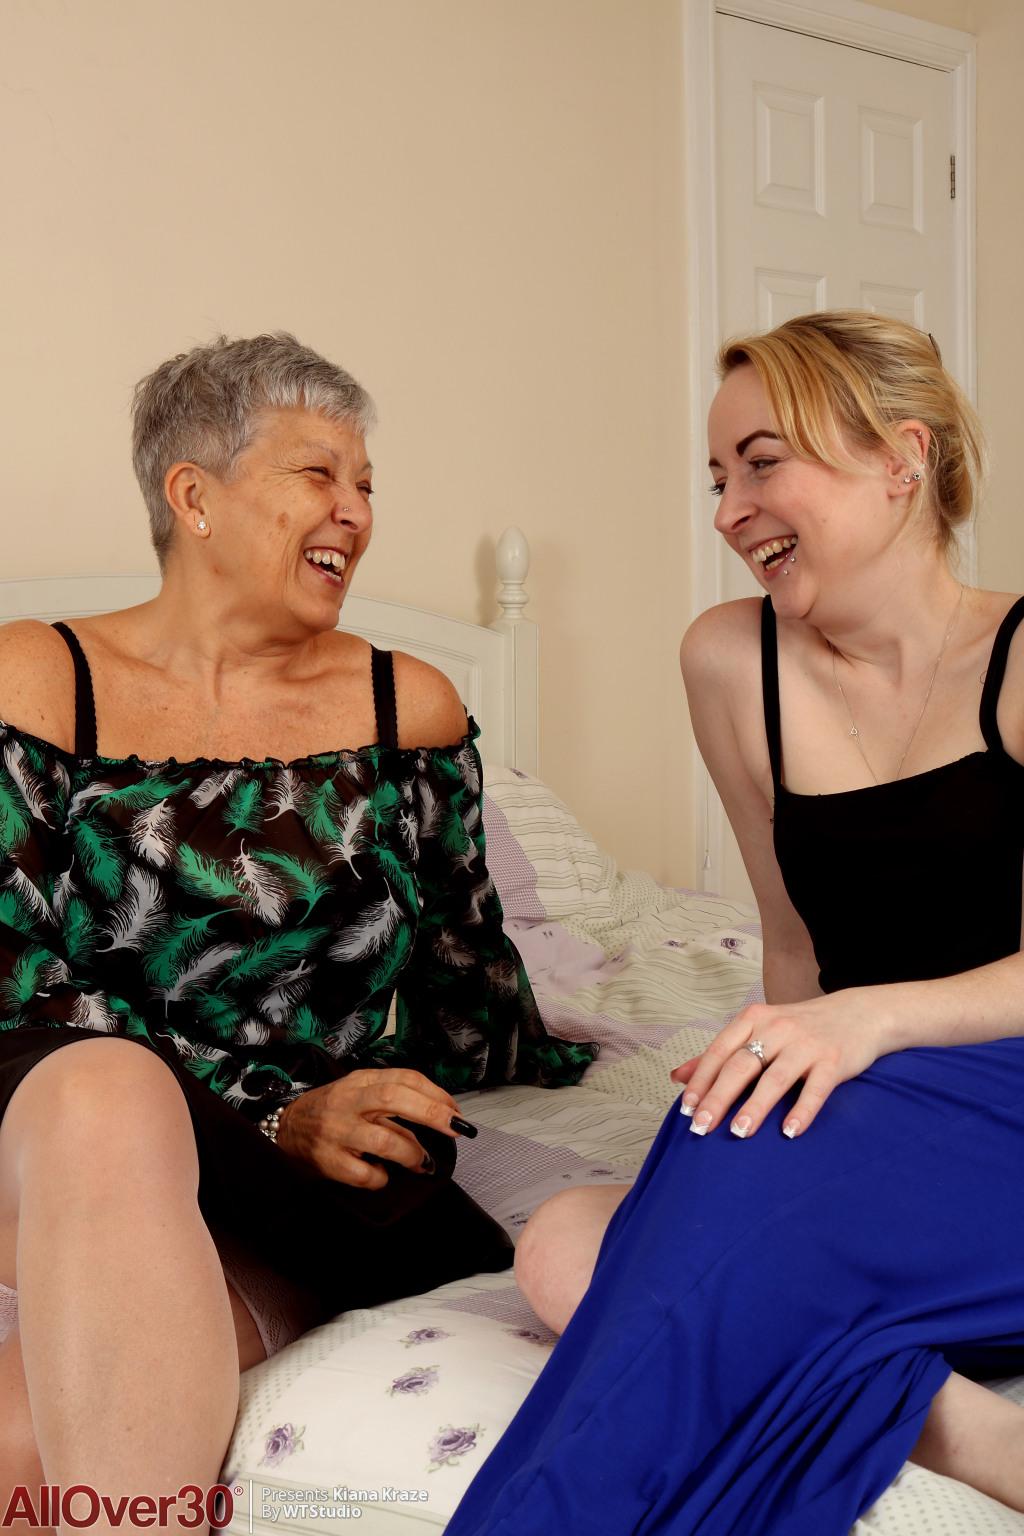 A december May lesbian fuck session between Kiana Kraze and Savana